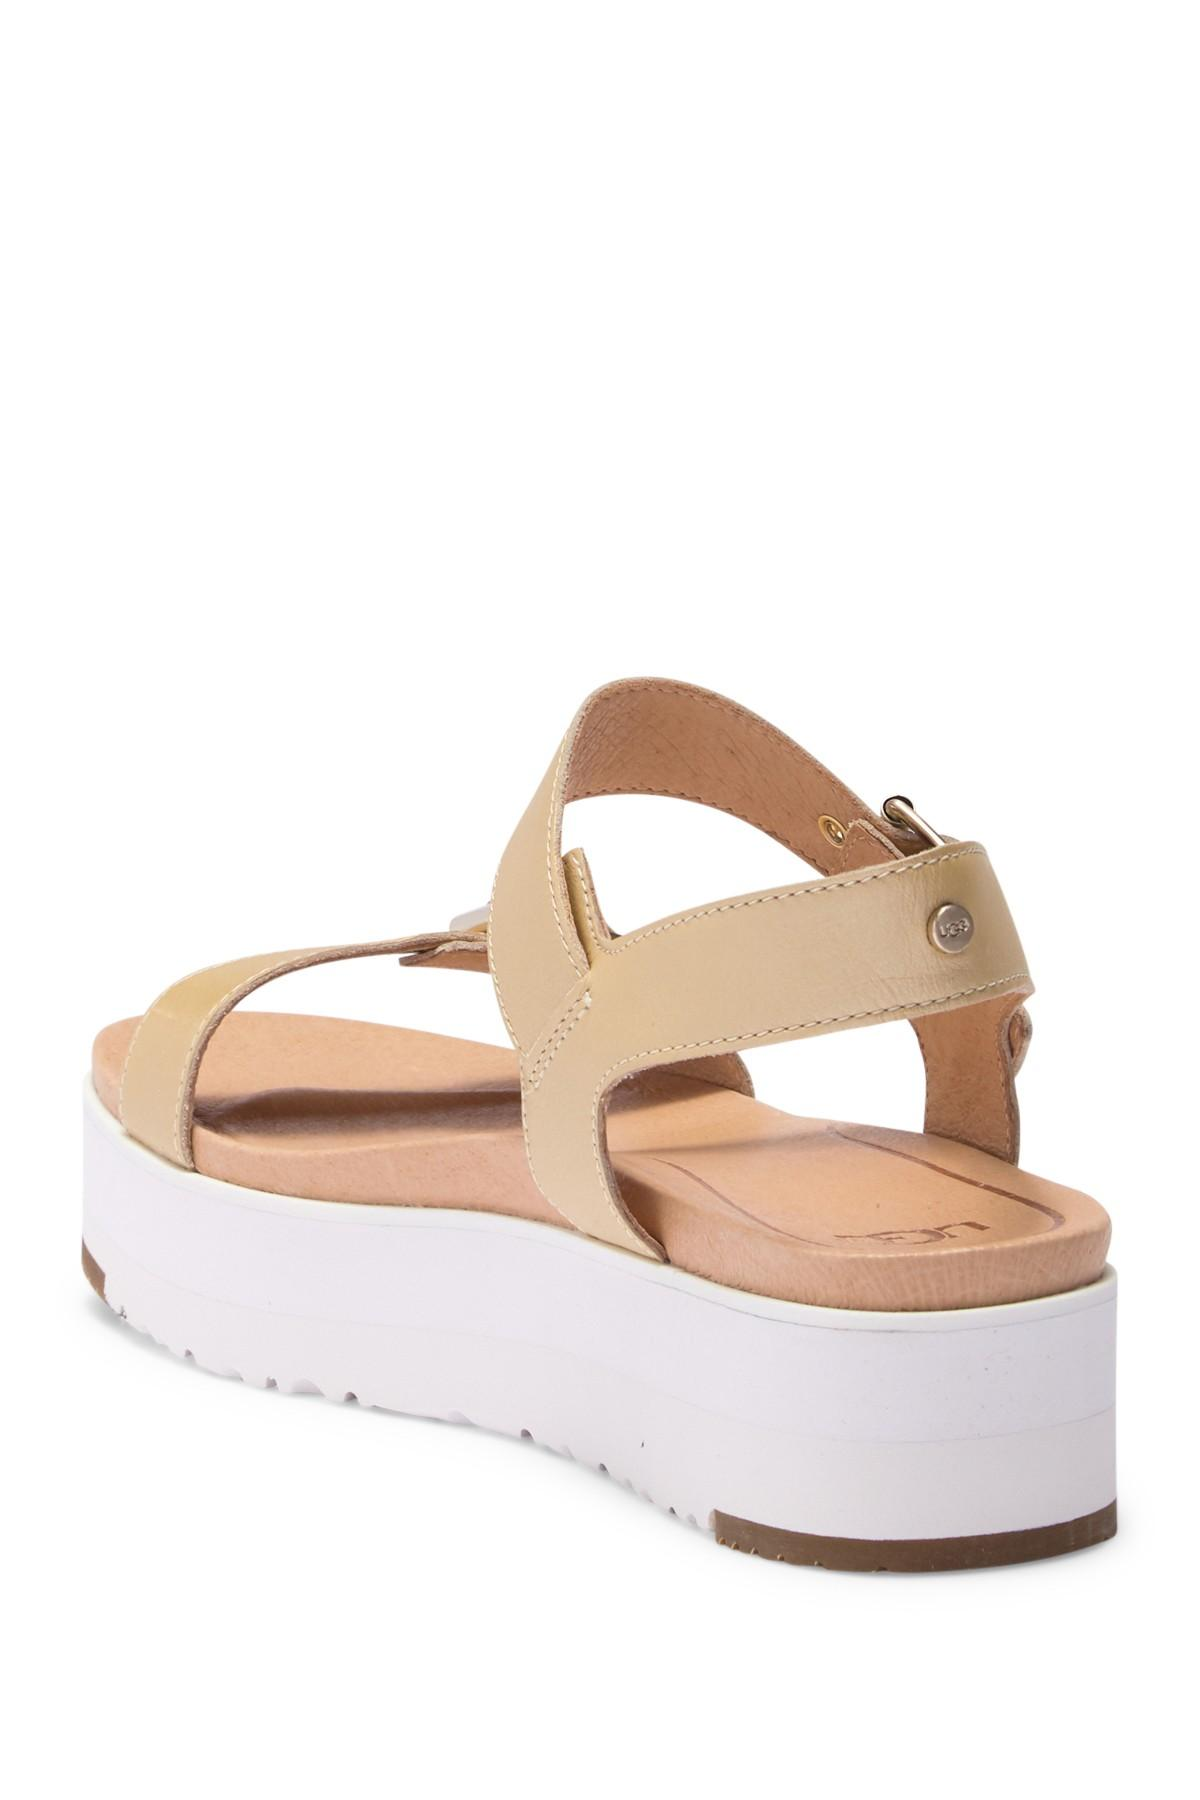 b06d036bc29 Women's Angie Metallic Leather Platform Sandal